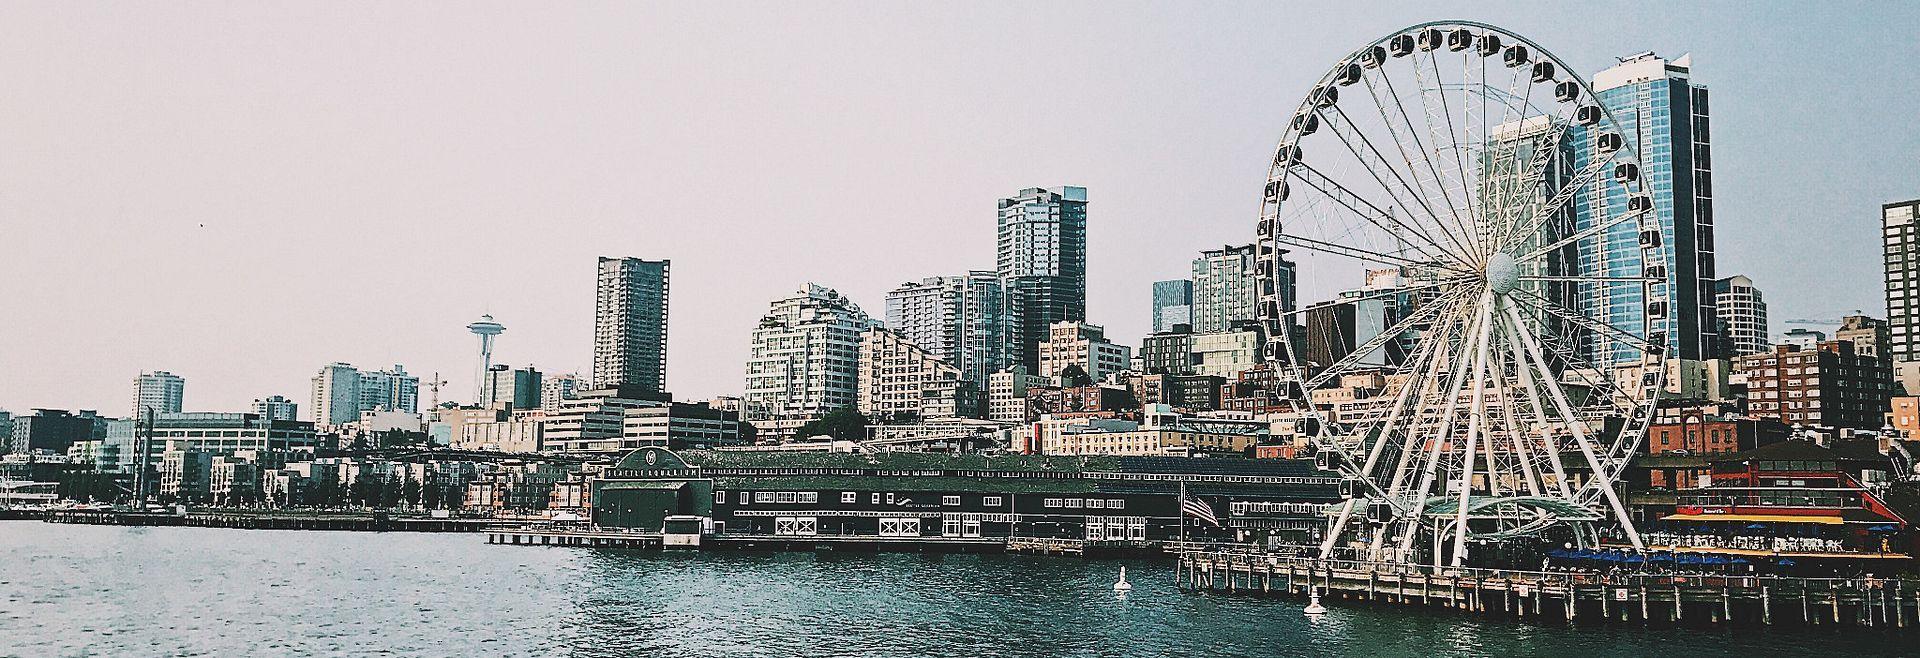 Seattle Skyline:Seattle Skyline Galavan Photo